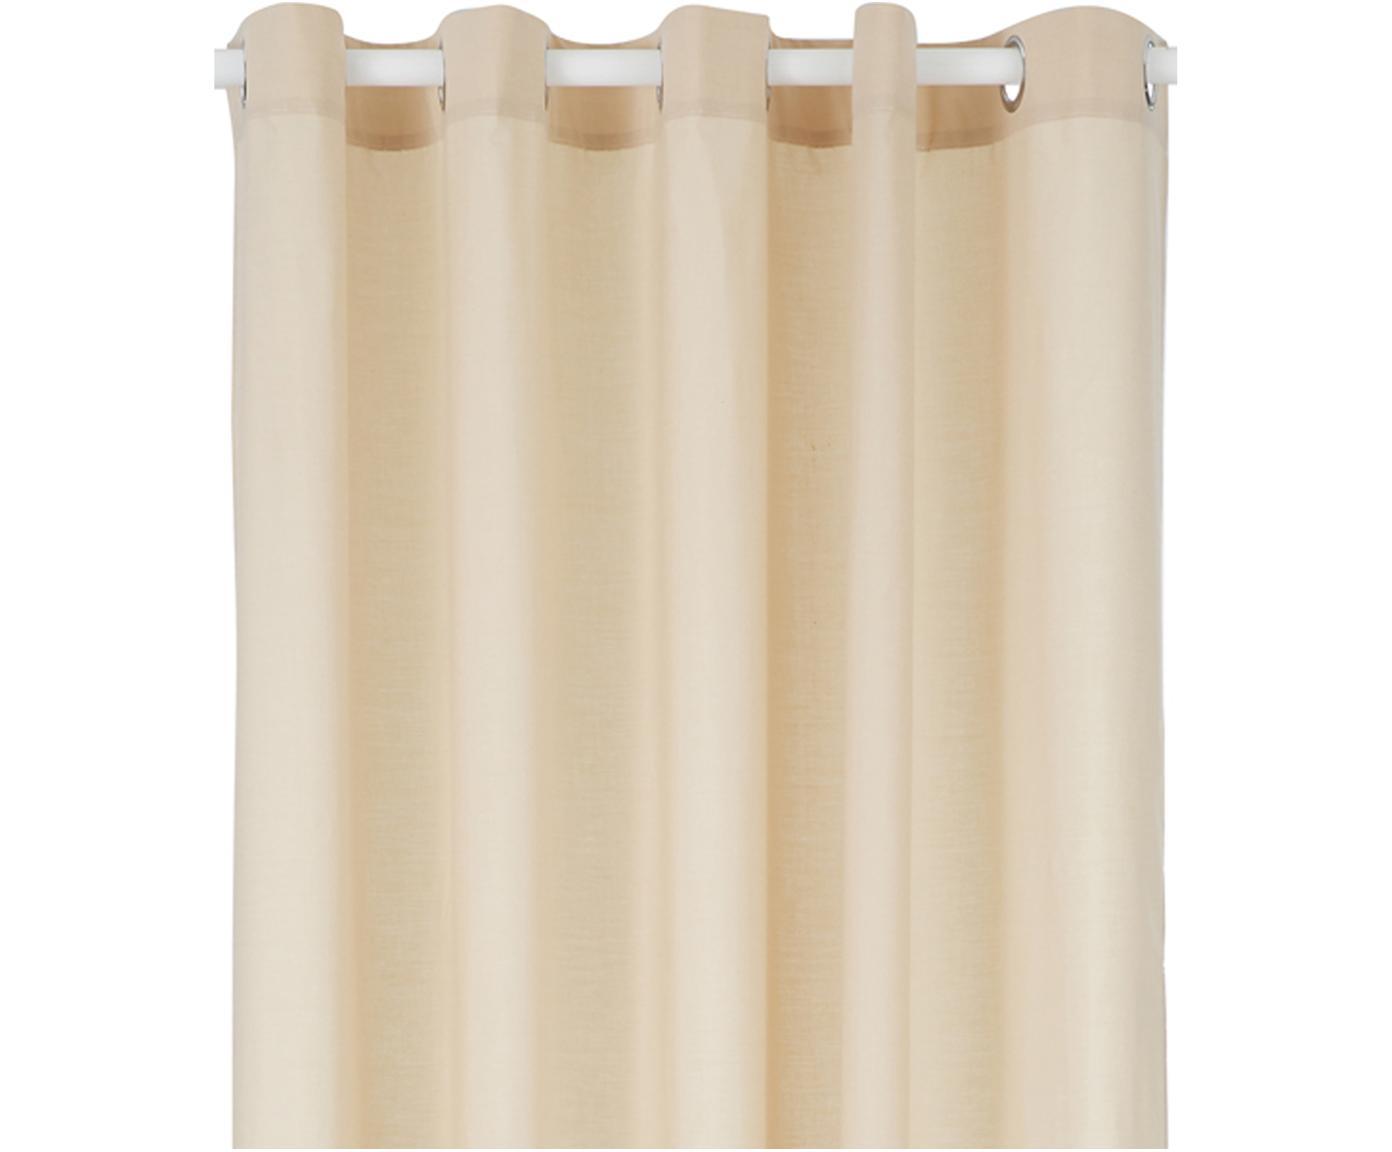 Cortina de baño Coloris, 67%poliéster, 33%algodón Repelente al agua, no impermeable, Beige, An 180 x L 200 cm